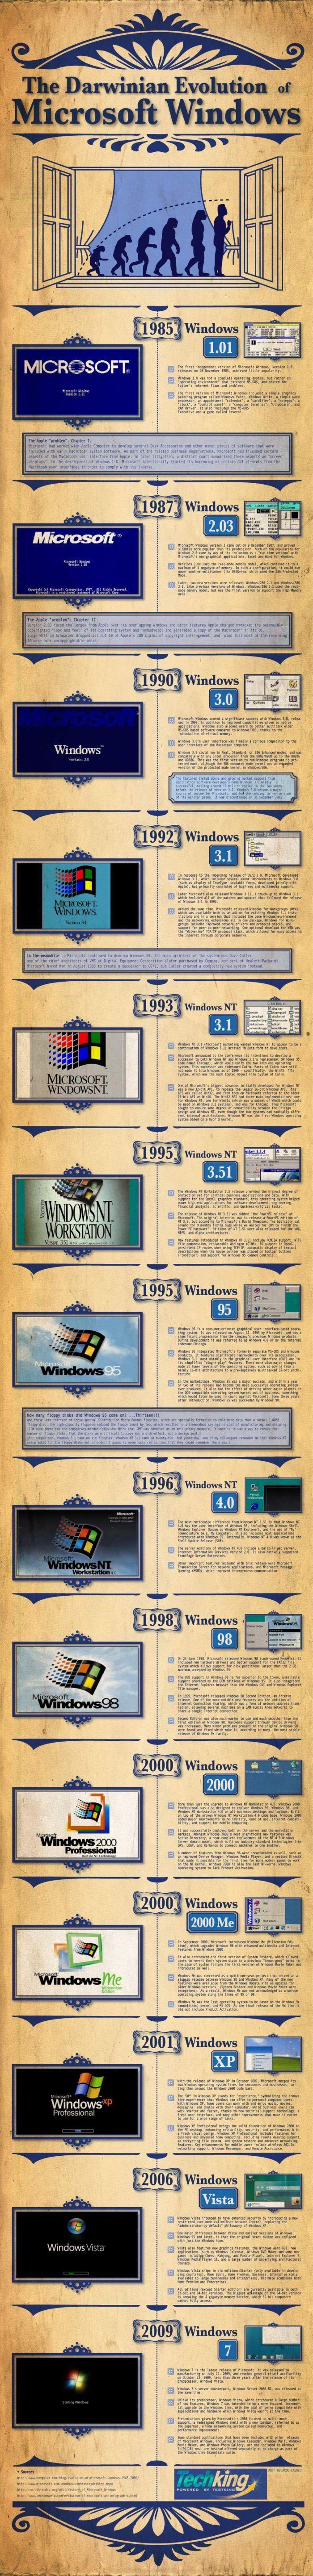 The Darwinian Evolution of Microsoft Windows (infographic)